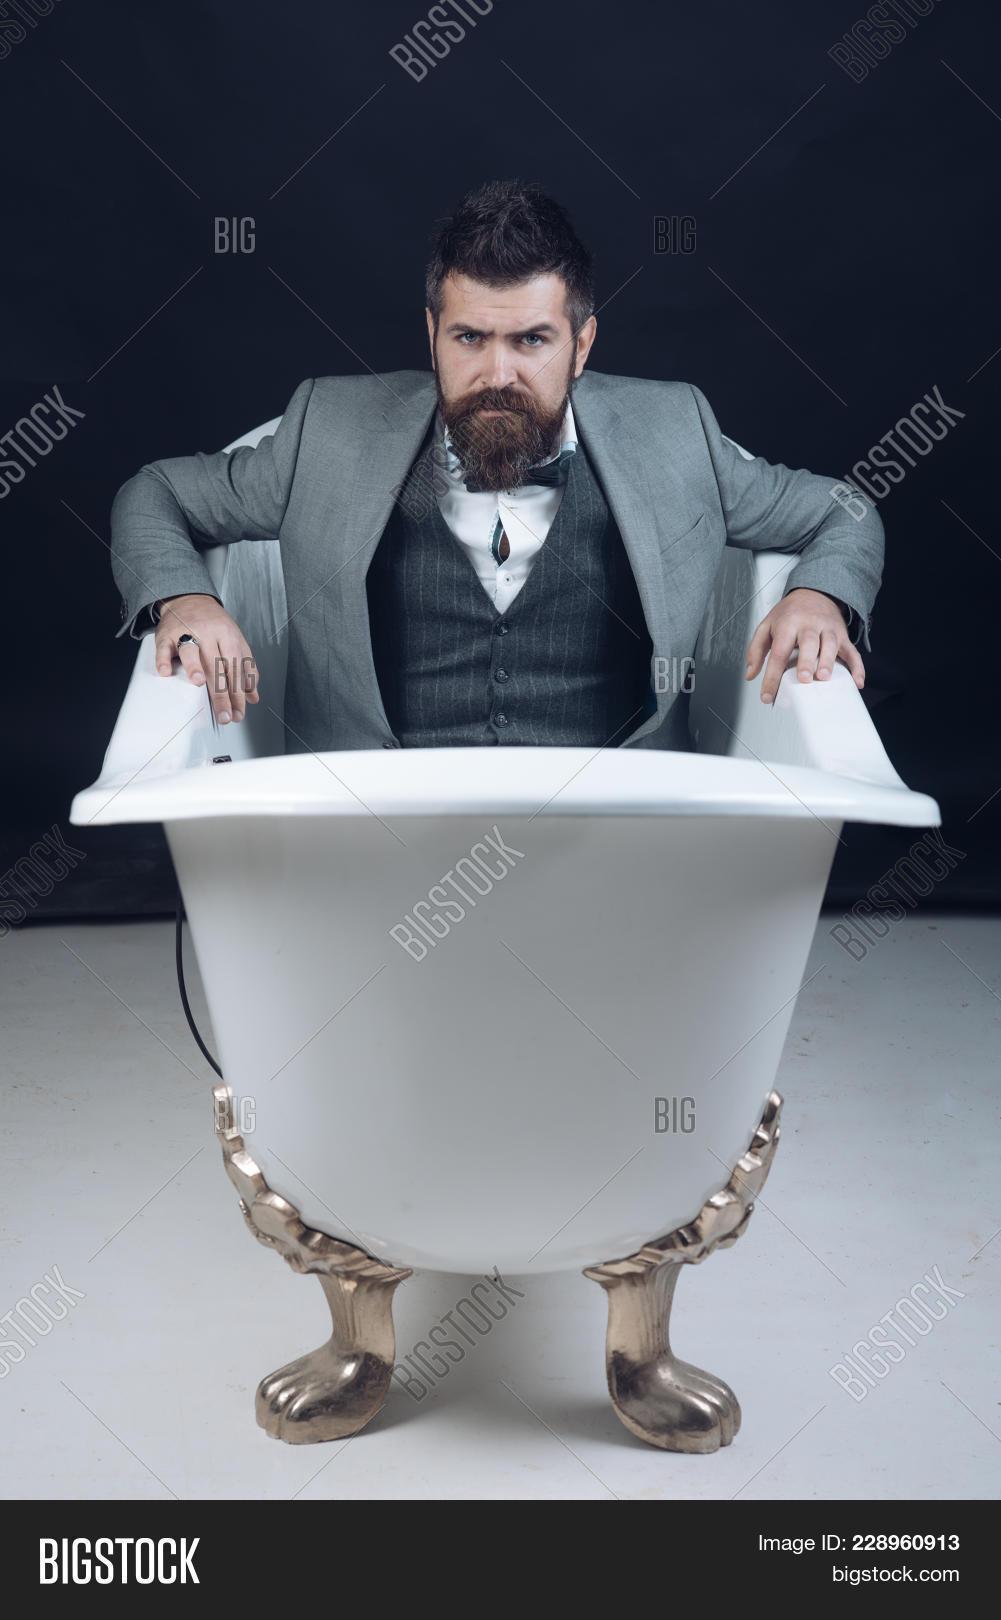 Hipster Stylish Image & Photo (Free Trial)   Bigstock